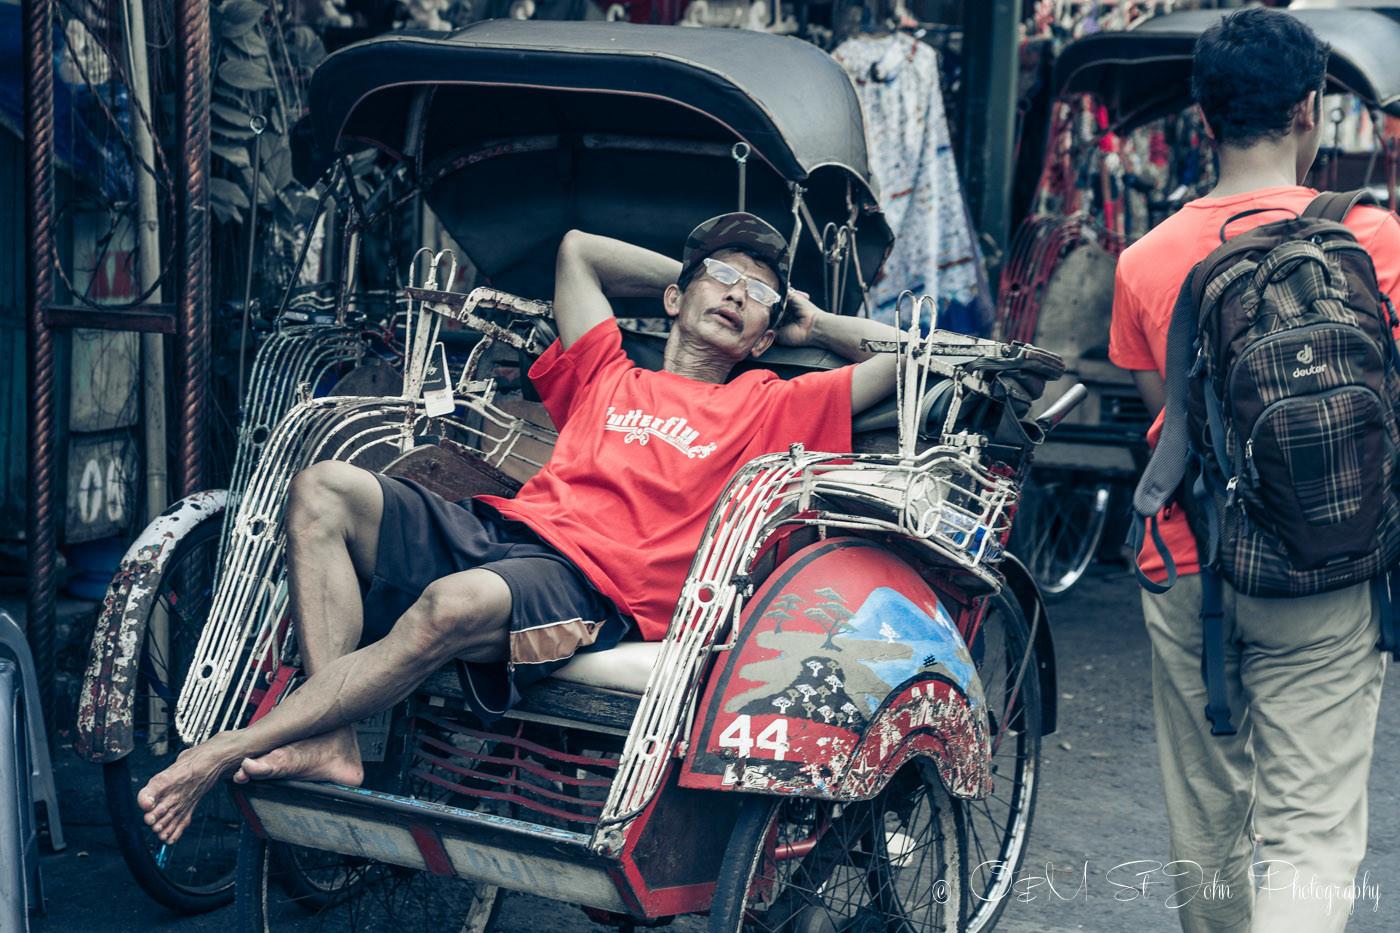 Becak driver taking a break on Jalan Malioboro before taking visitors on yogyakarta tour